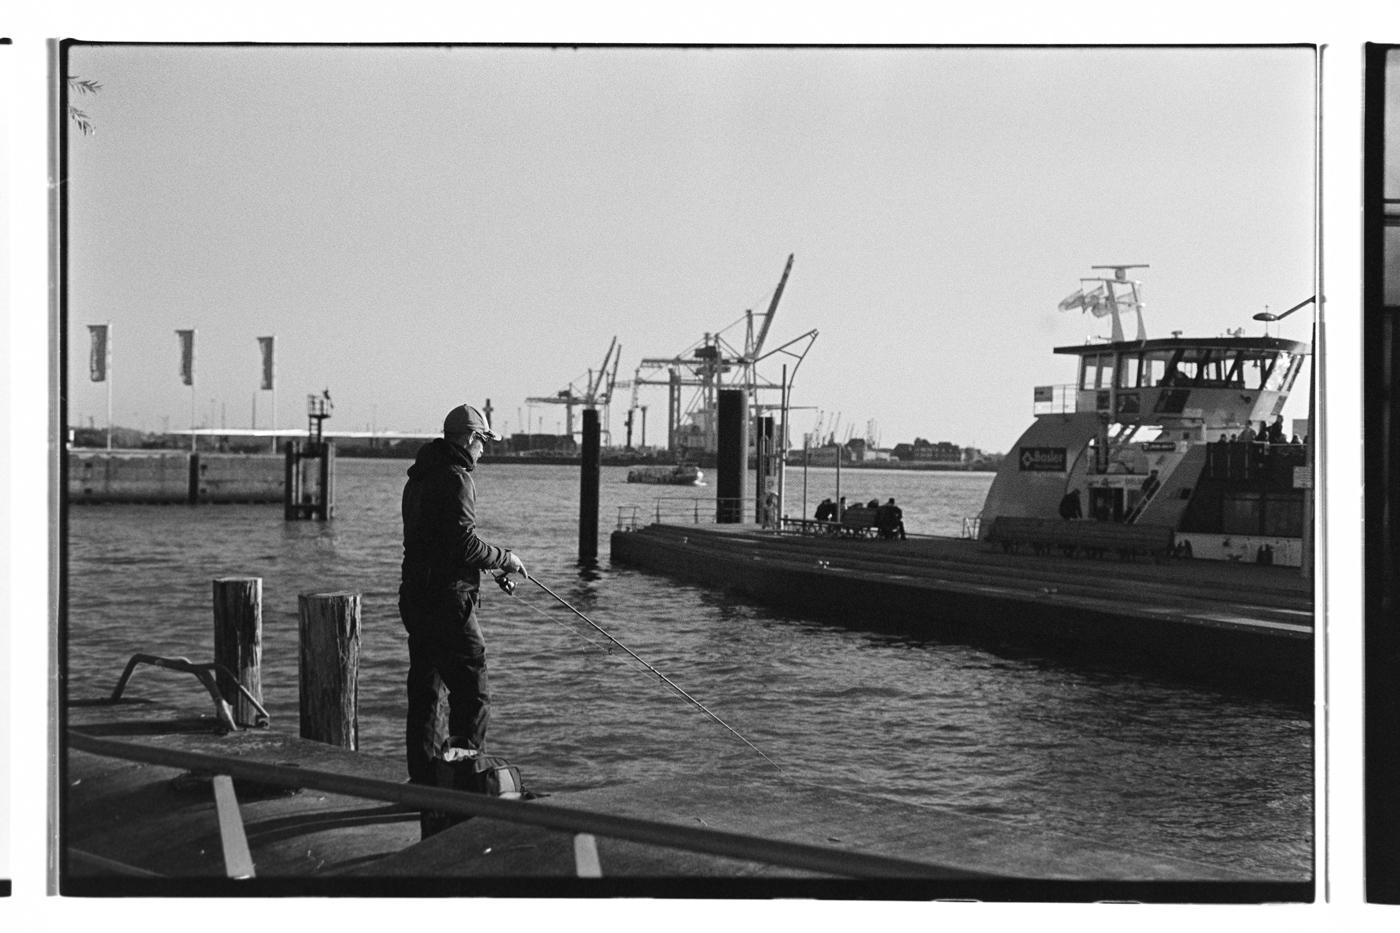 Fisherman in Hamburger Hafen